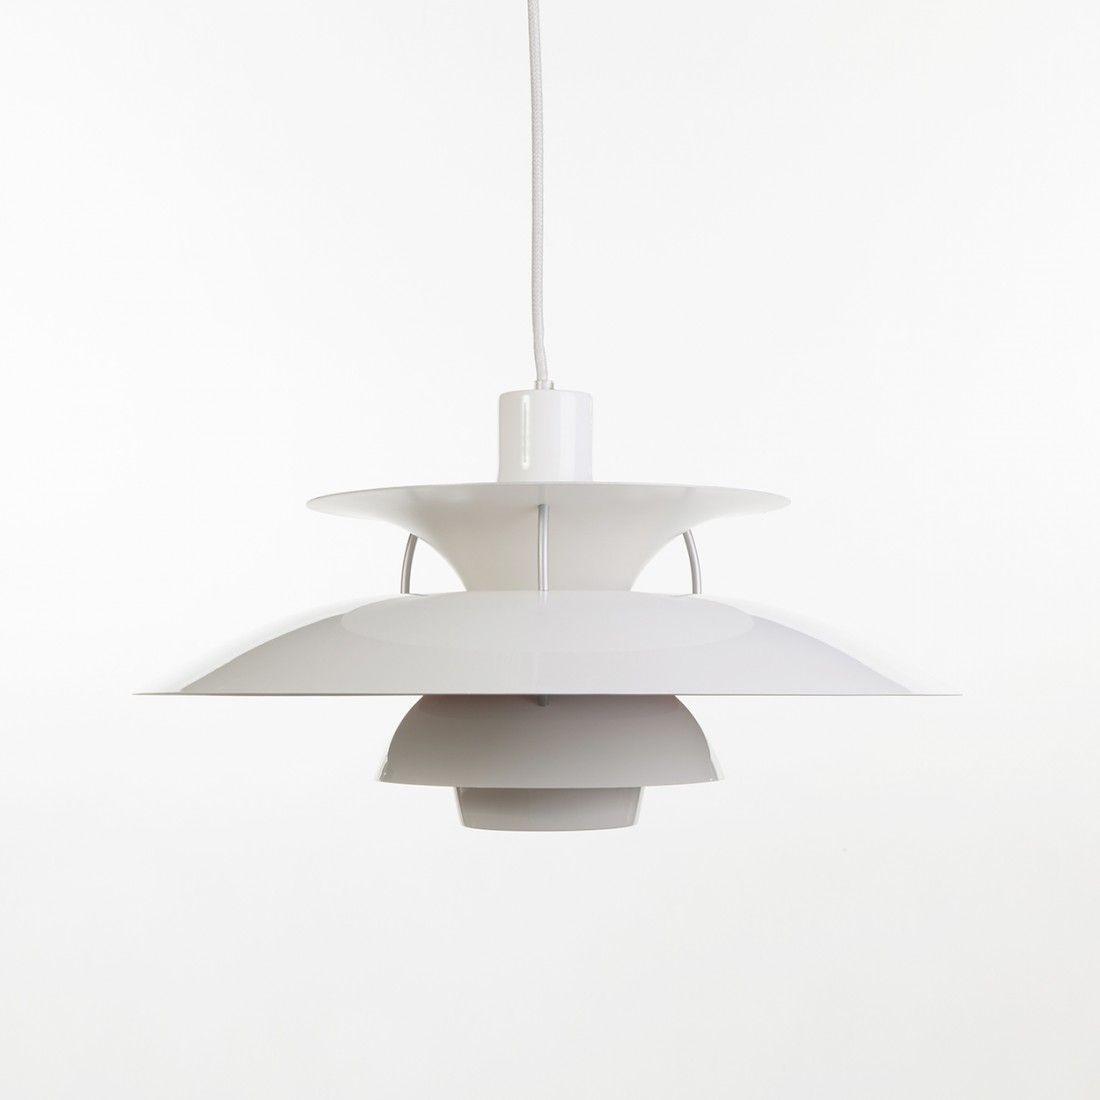 Henningsen 50 Pendant Lamp Mid century Midcentury modern and